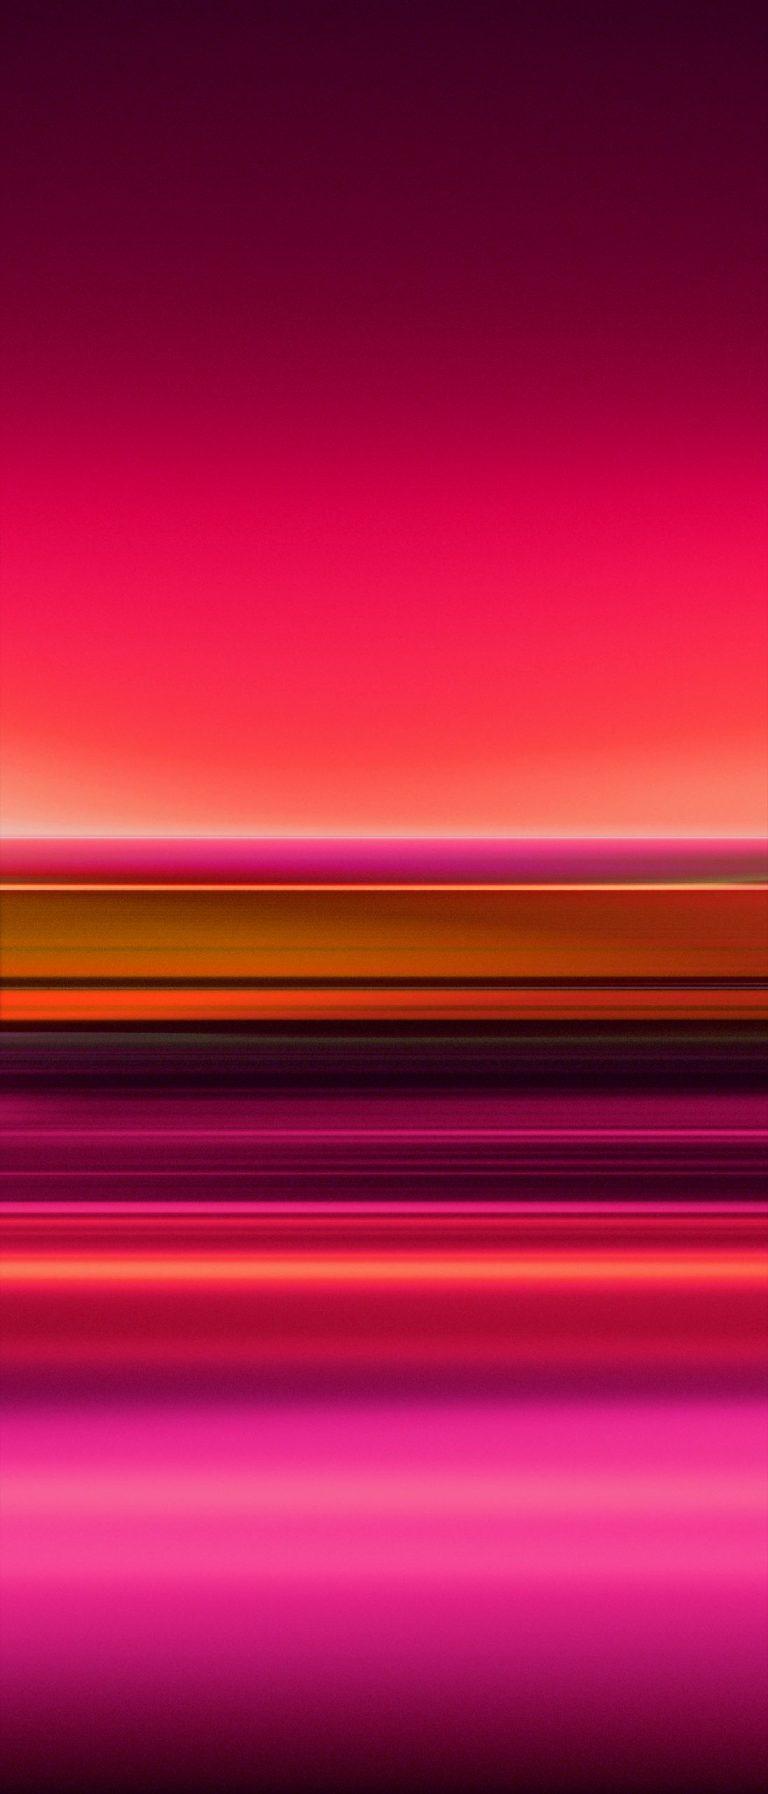 Sony Xperia 5 Stock Wallpaper 07 1096x2560 768x1794